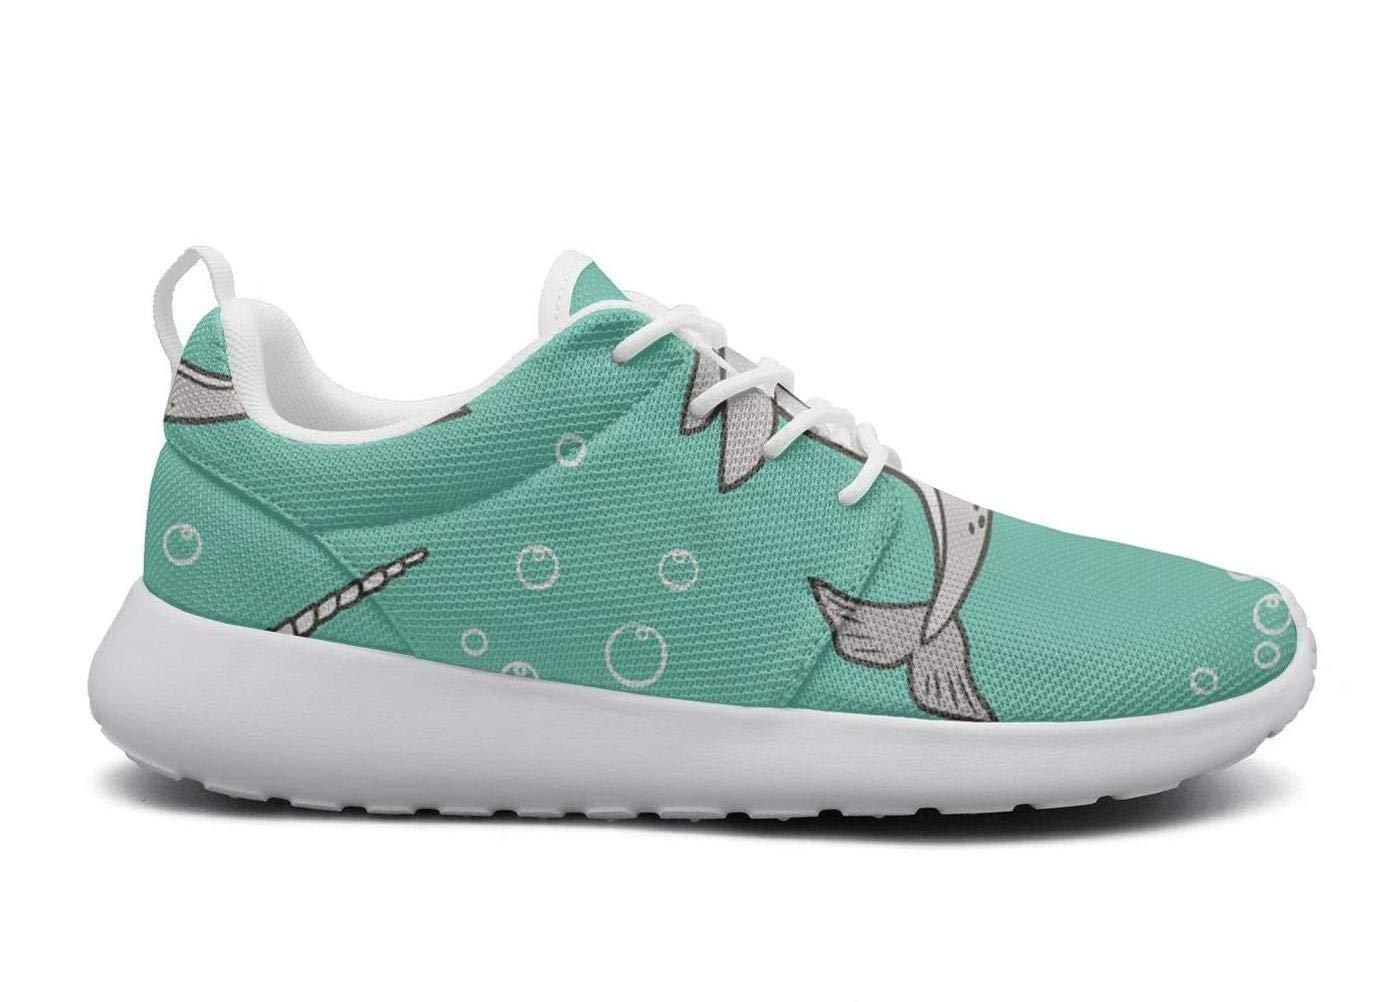 IOJEYOIRFJ Cartoon Narwhal Grey Green Backdrop Womens Fashion Lightweight Running Shoes